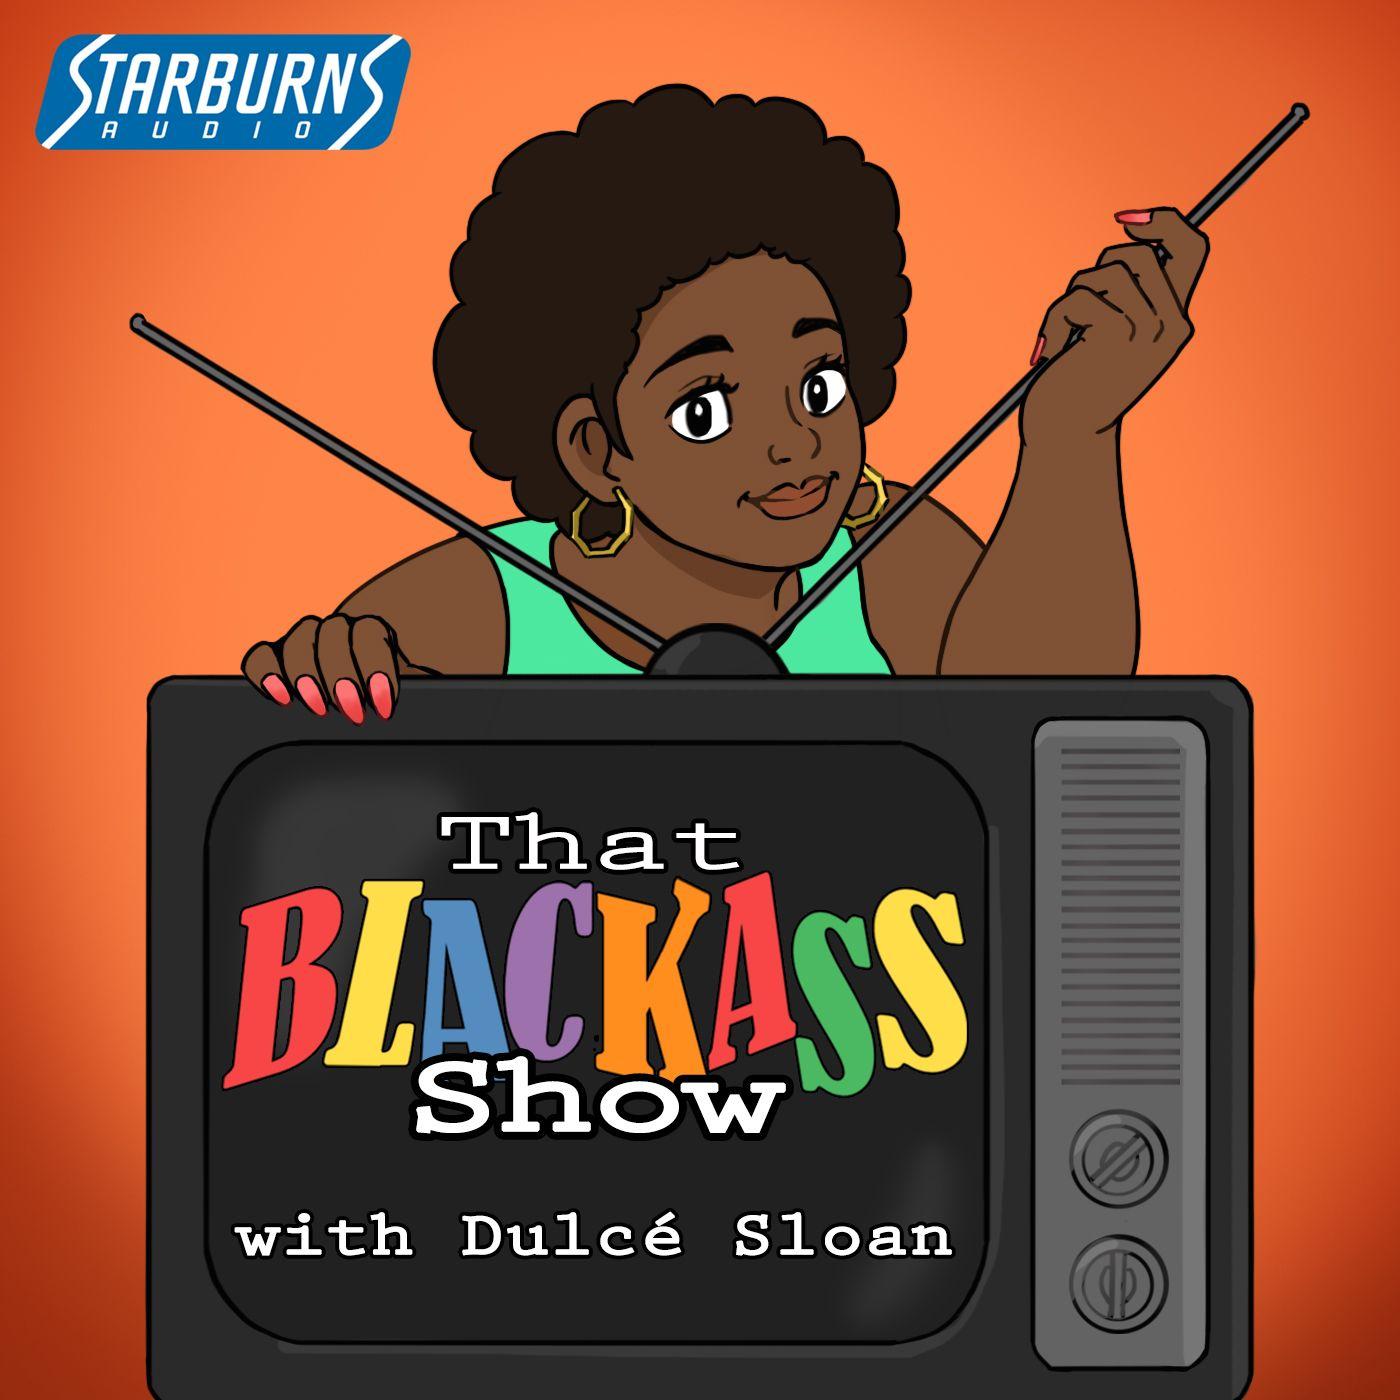 That Blackass Show - Trailer